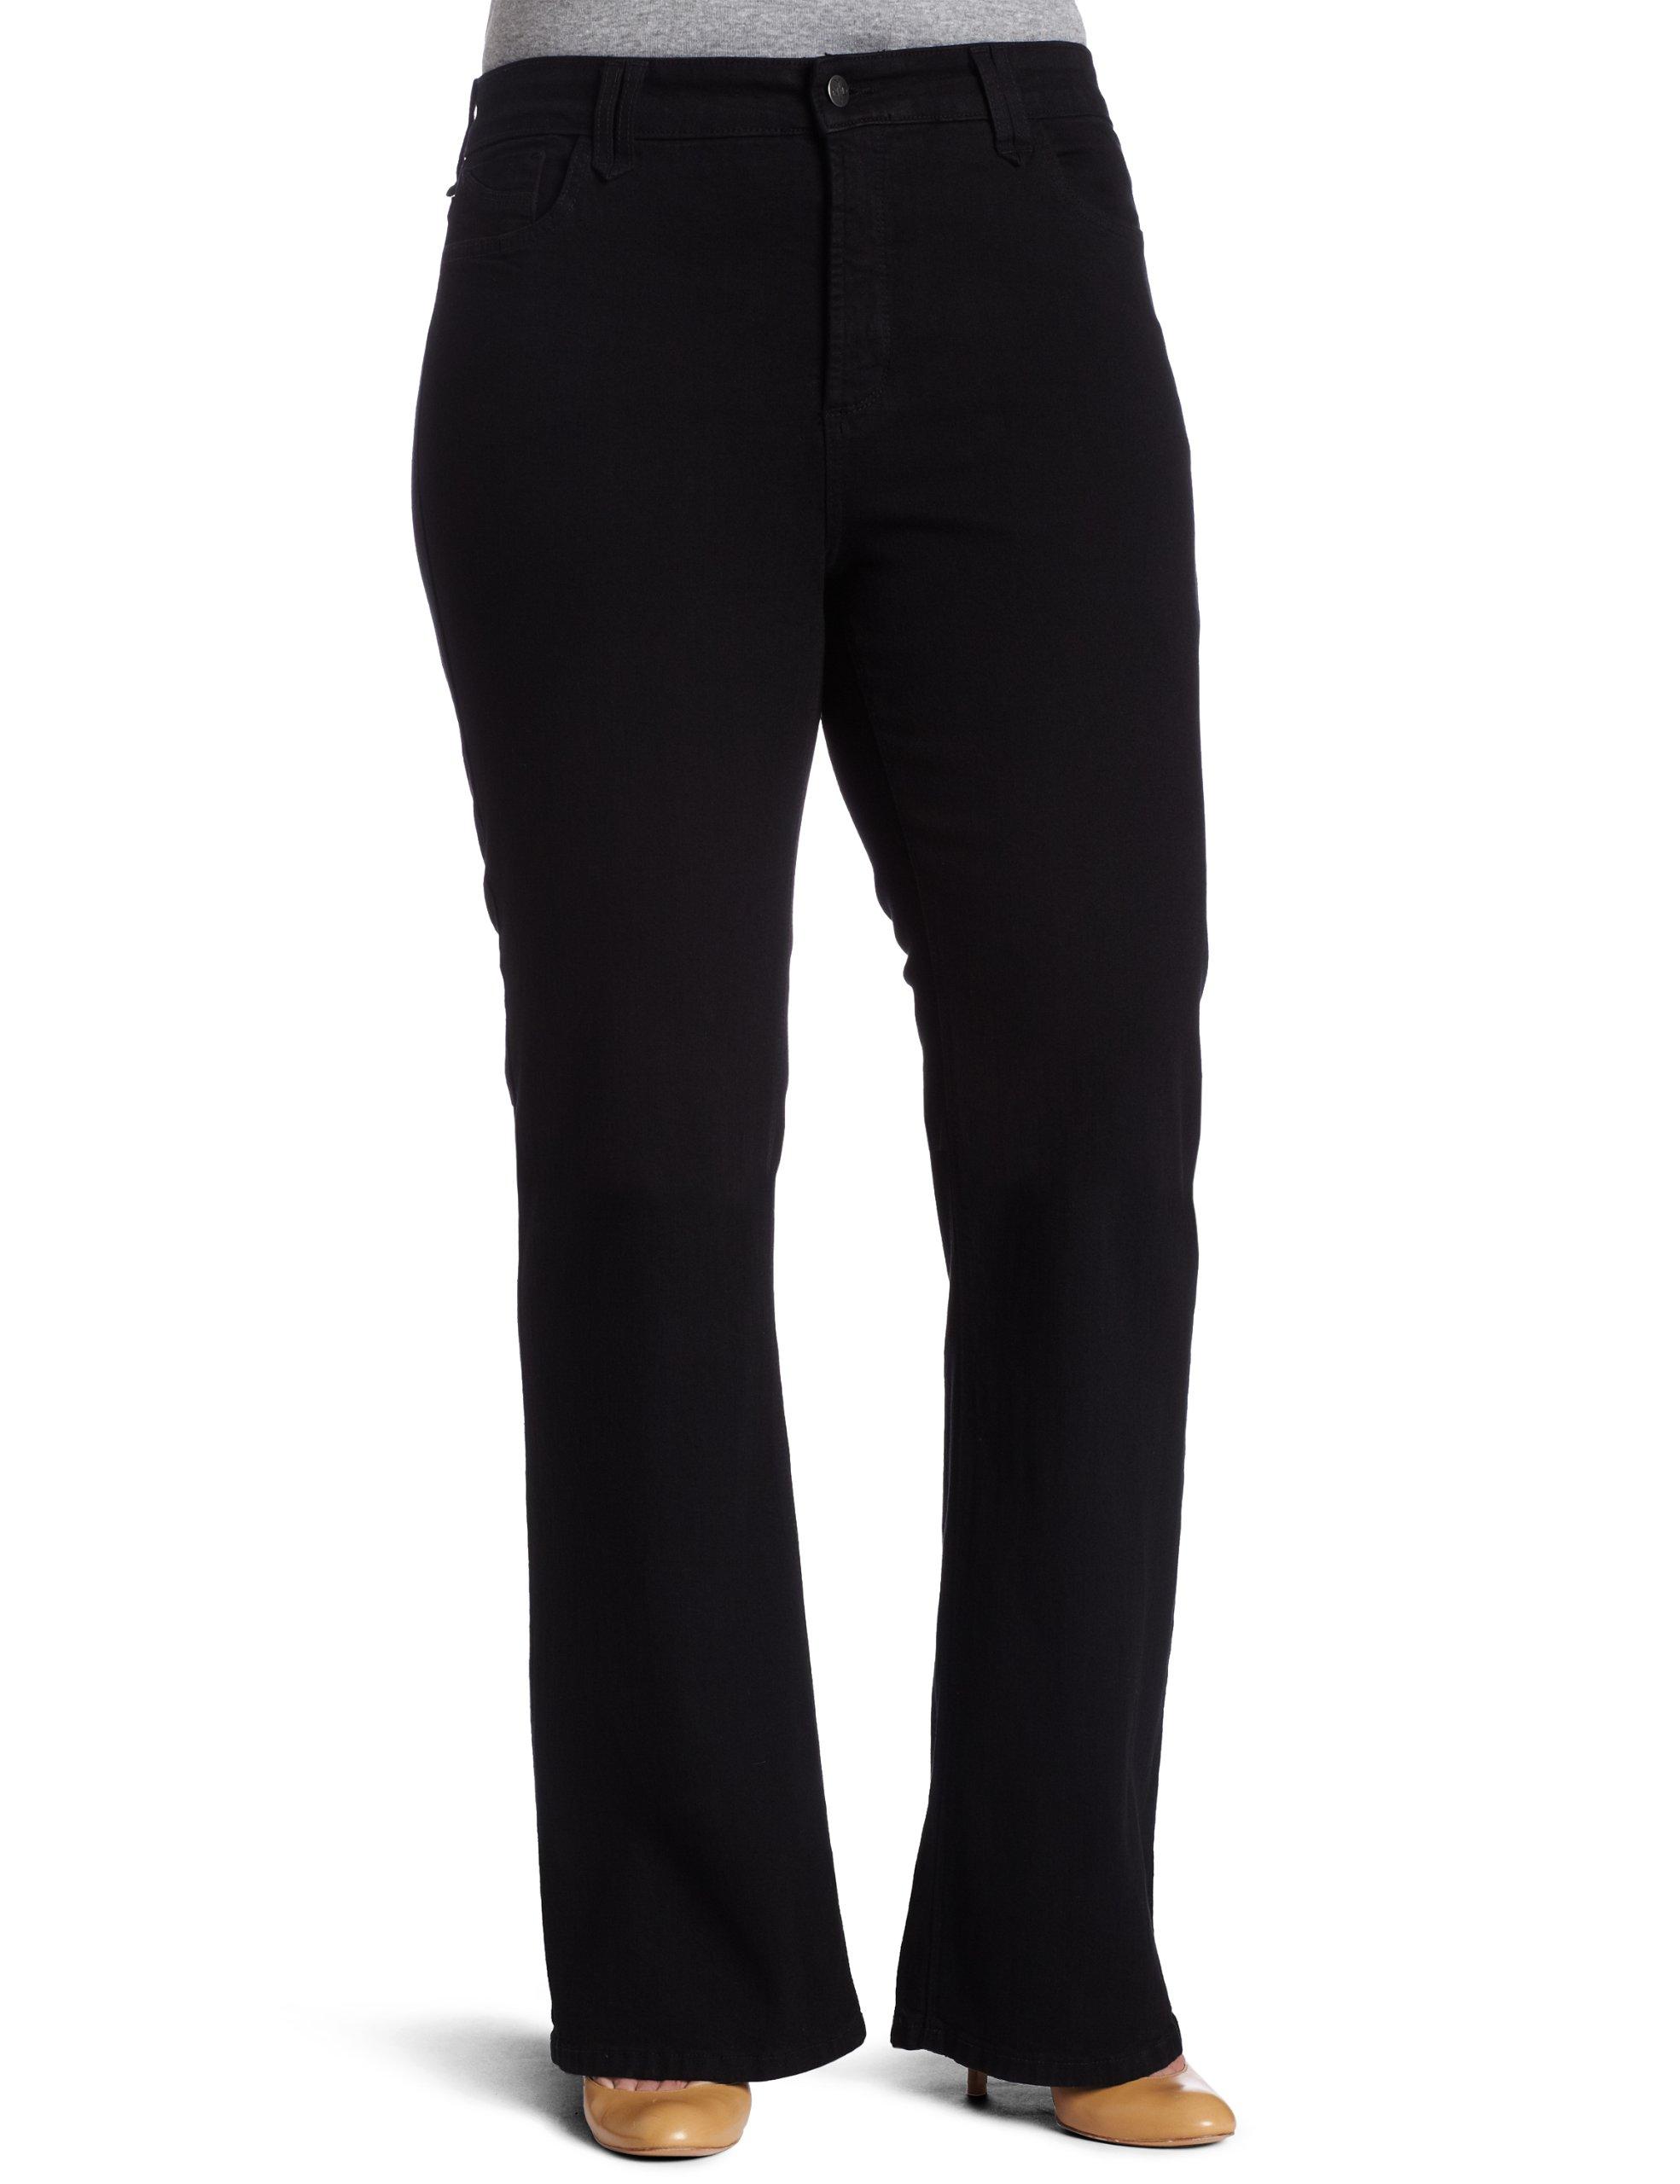 NYDJ Petite Plus-size Hayden Bootcut Jeans, Black, 28WP